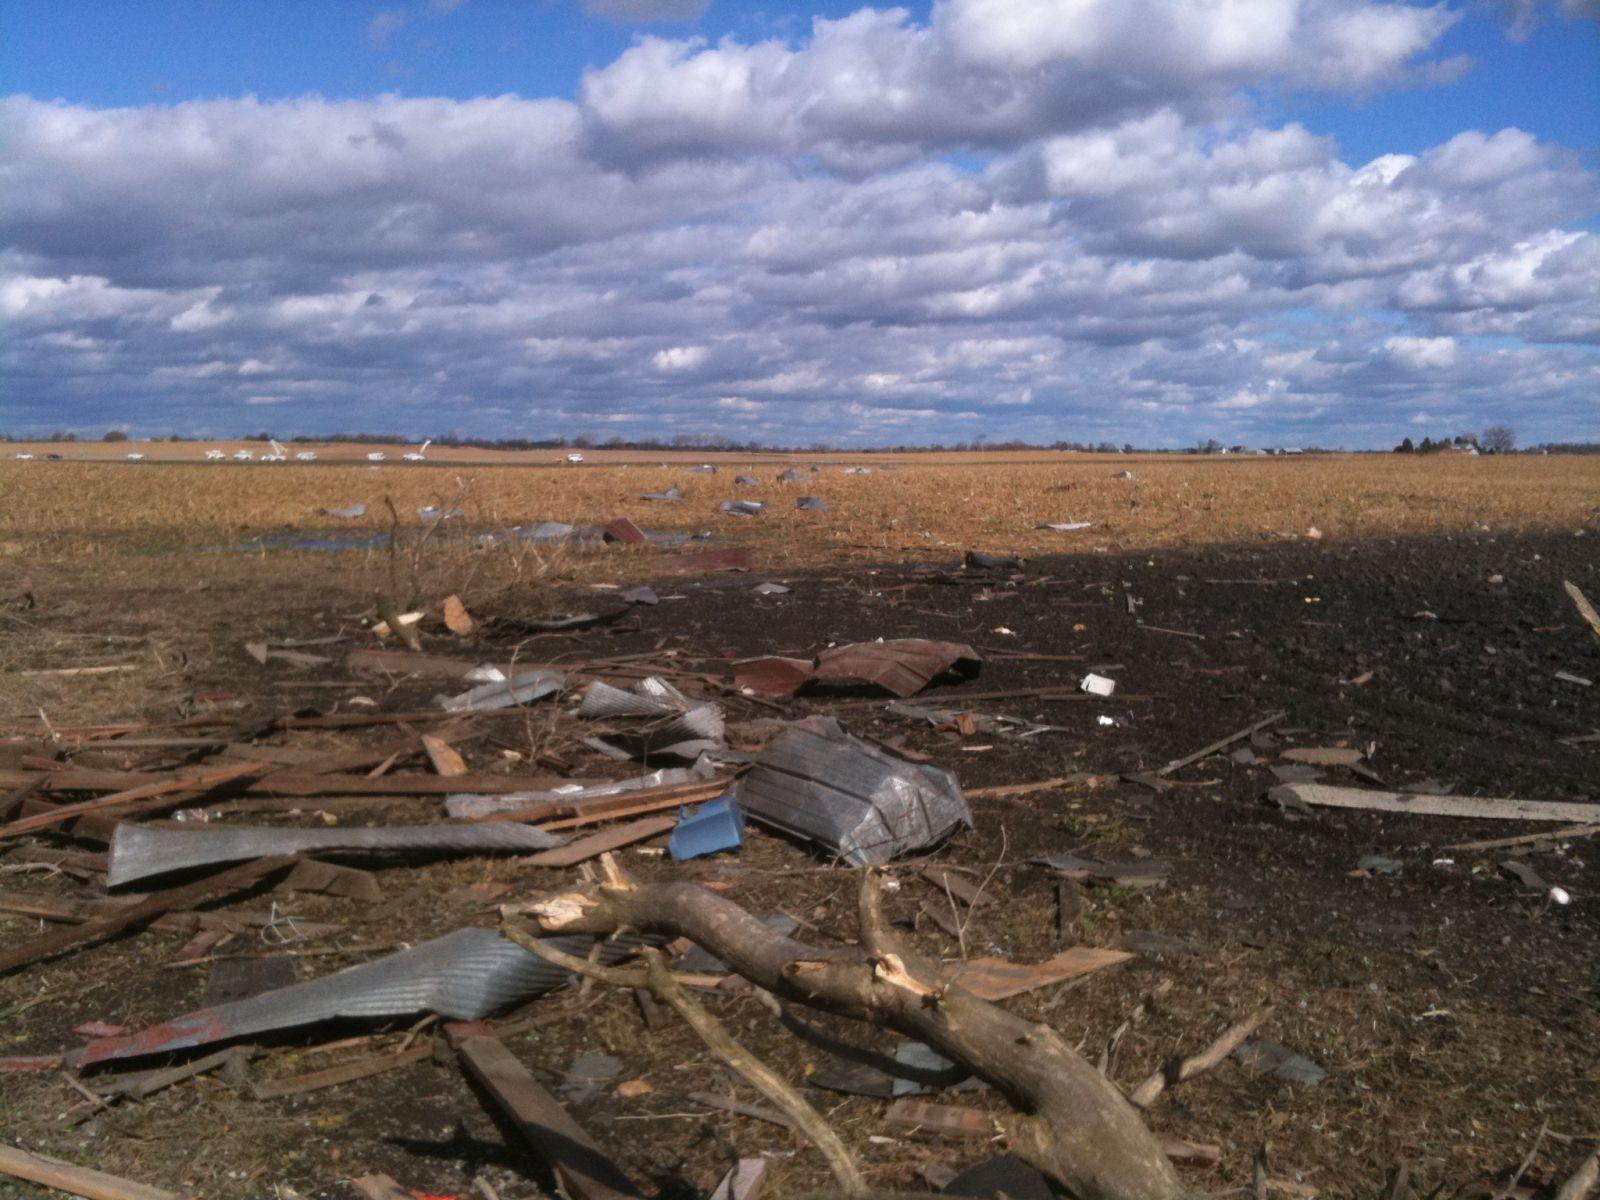 EF2 debris path east of Peotone